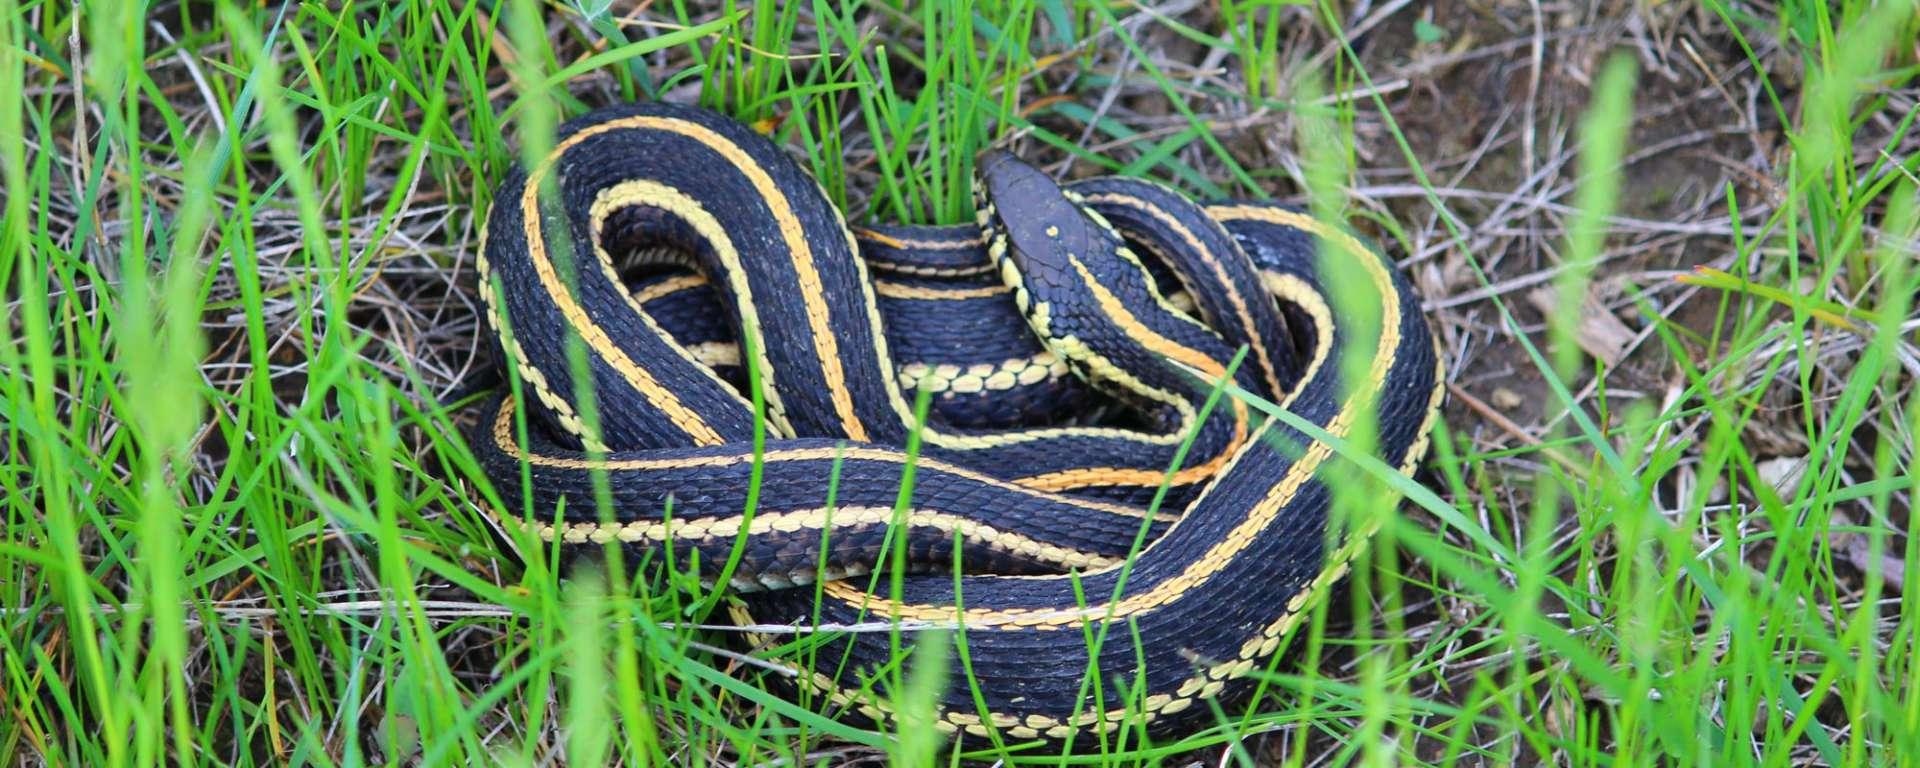 safari spotlight snakes in the grass safari west